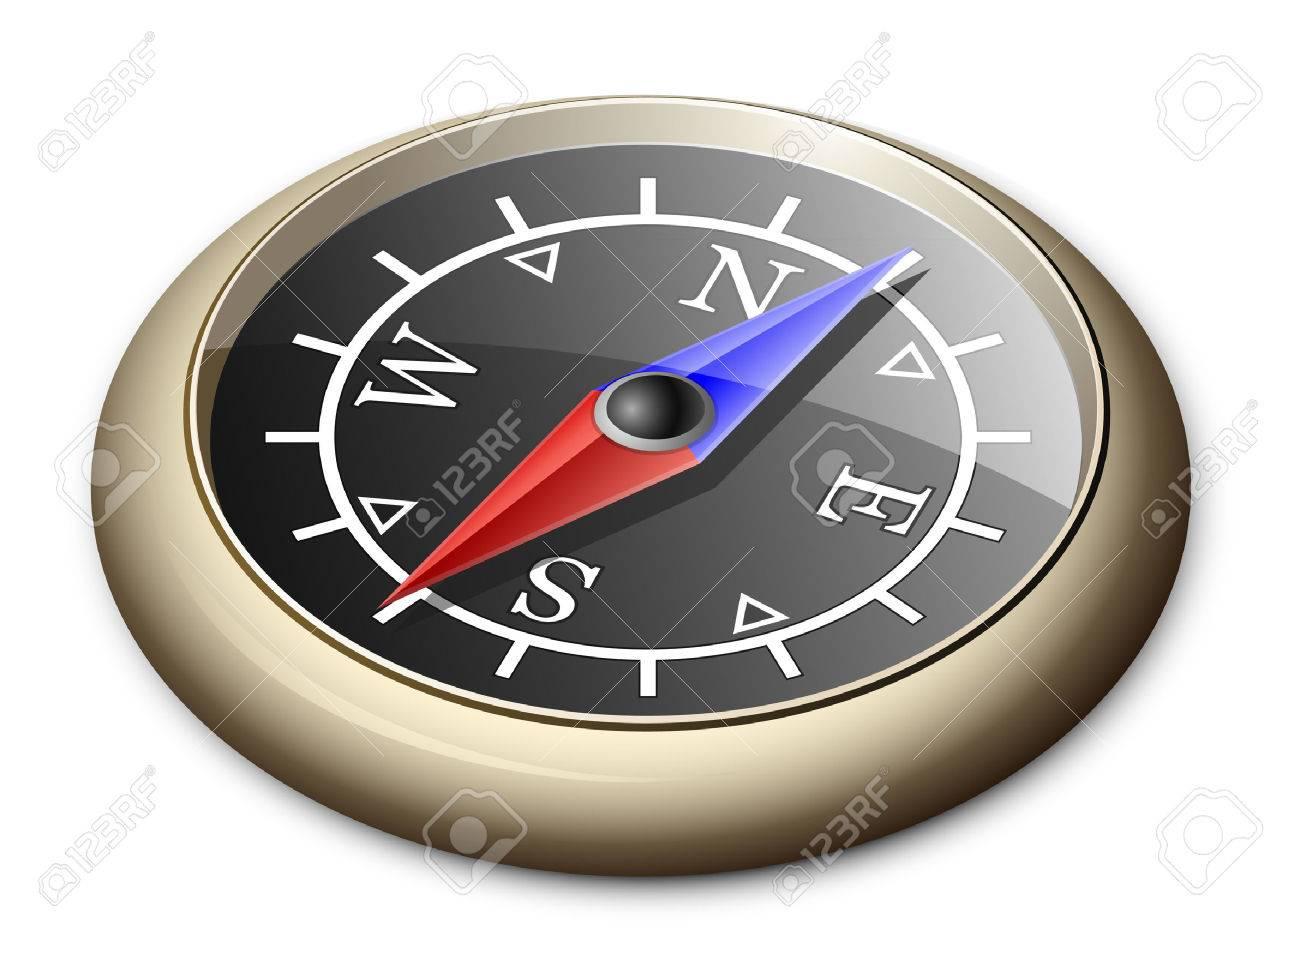 Illustration Of Brass Compass Stock Vector - 8142395